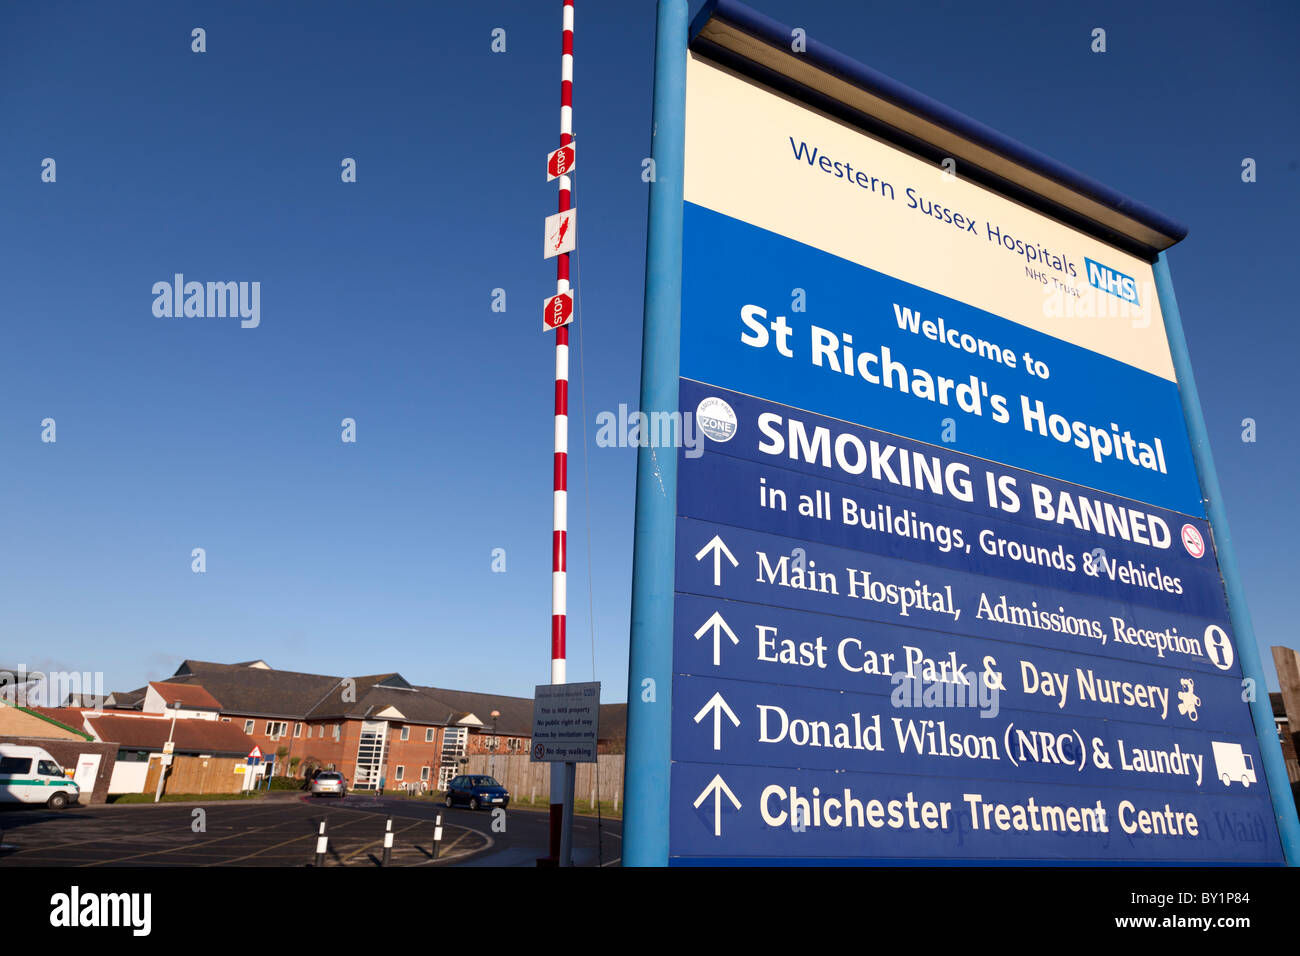 Wegweiser an Bord äußere des St Richards, Chichester Krankenhaus Stockbild